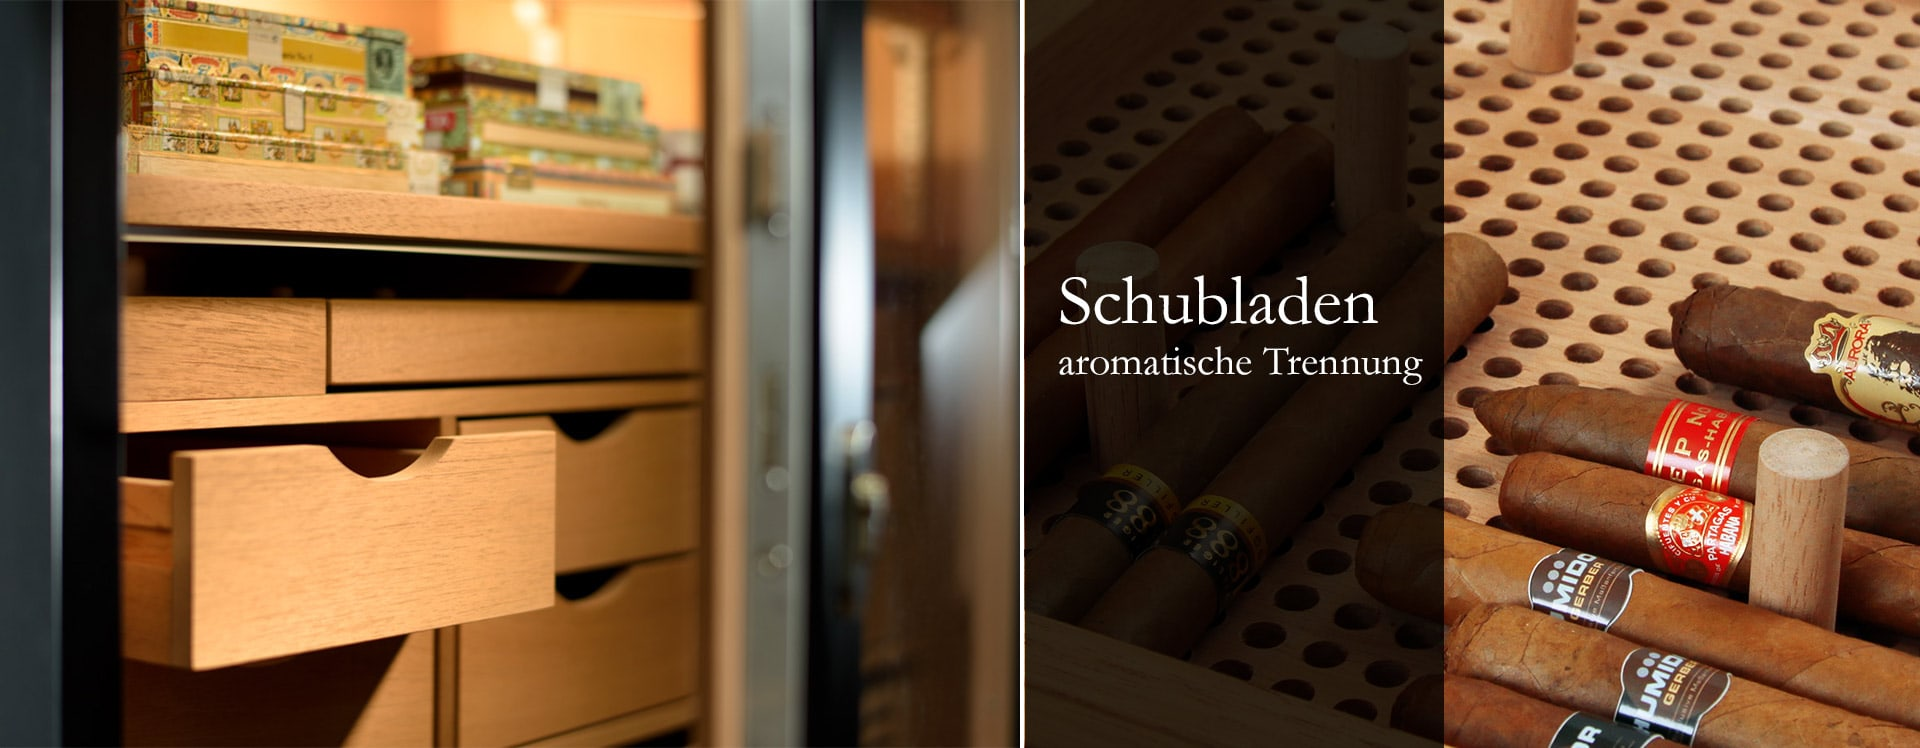 GERBER Humidor Schubladen